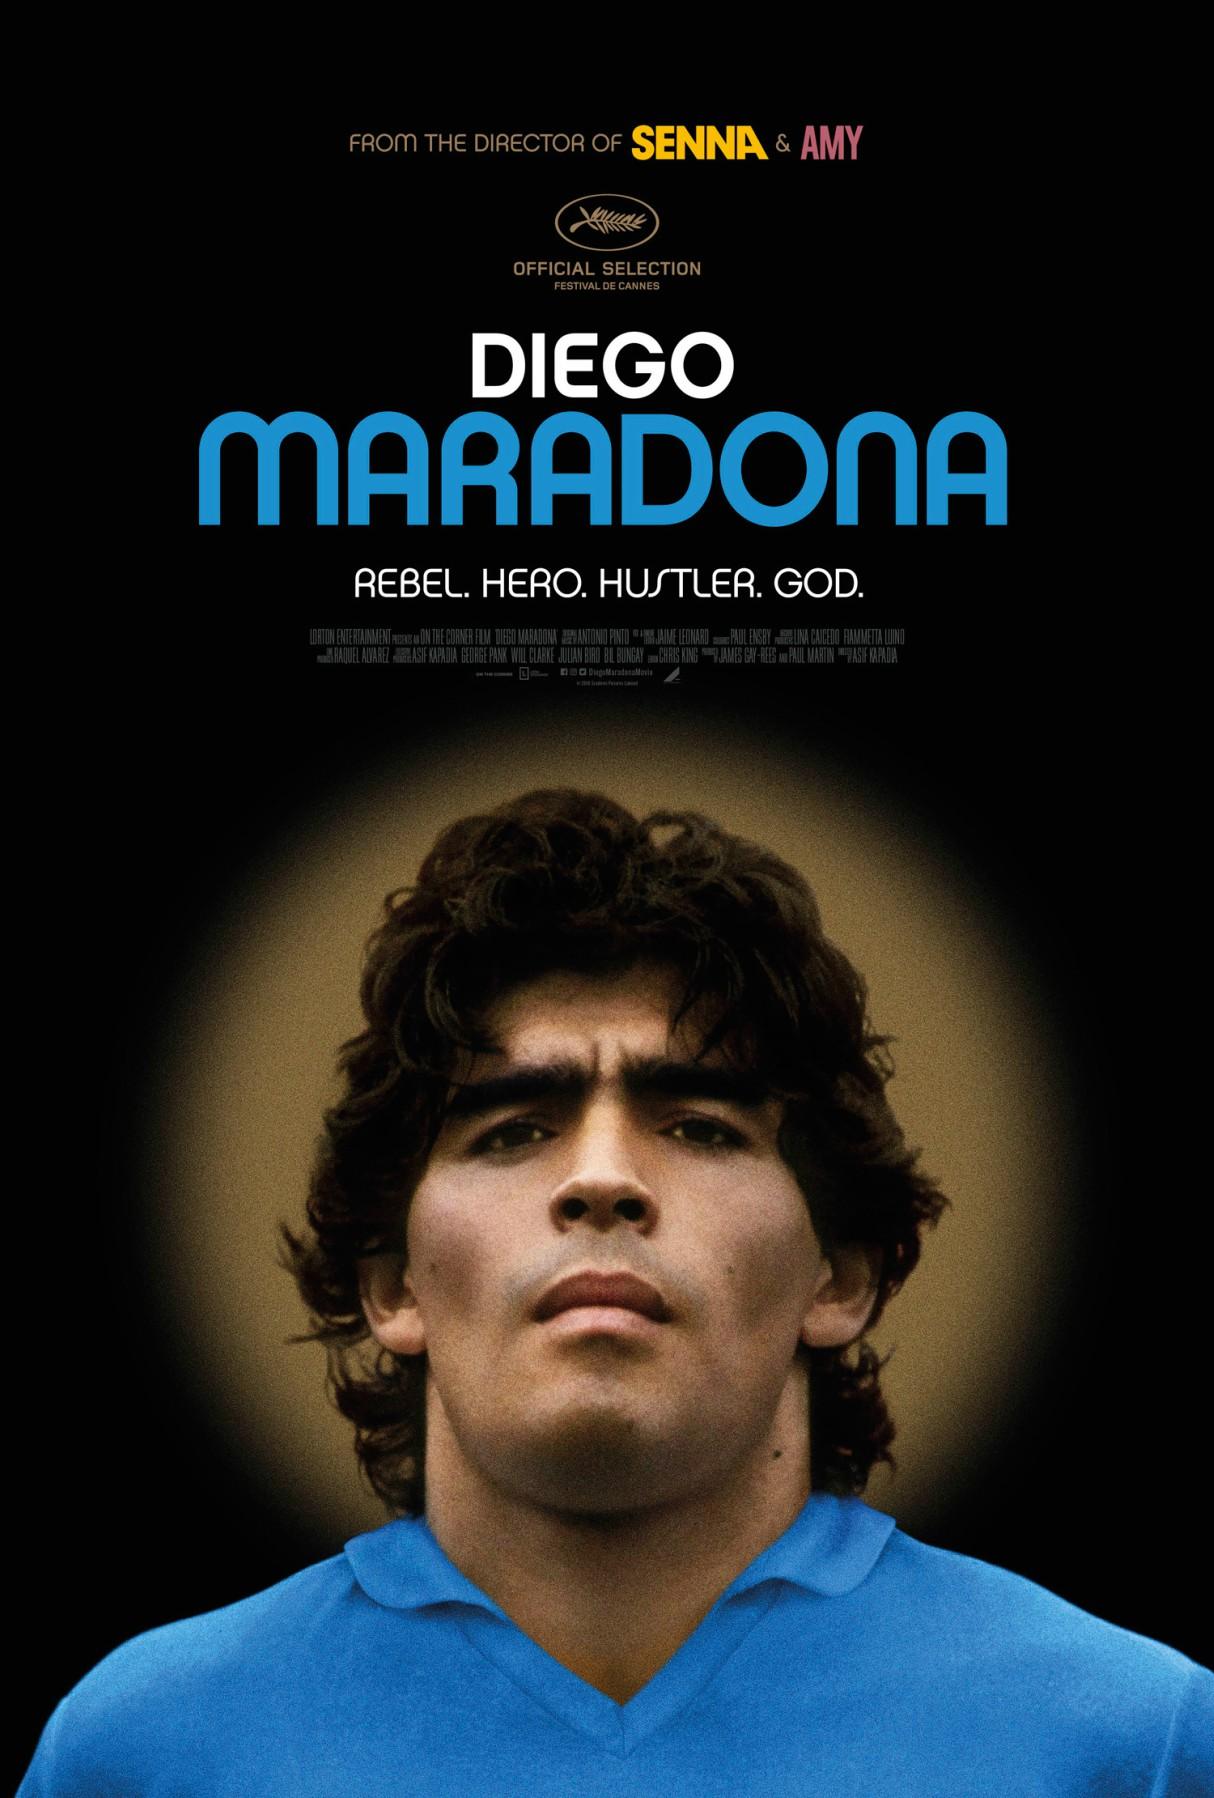 diego-maradona-film-movie-2019-review-poster